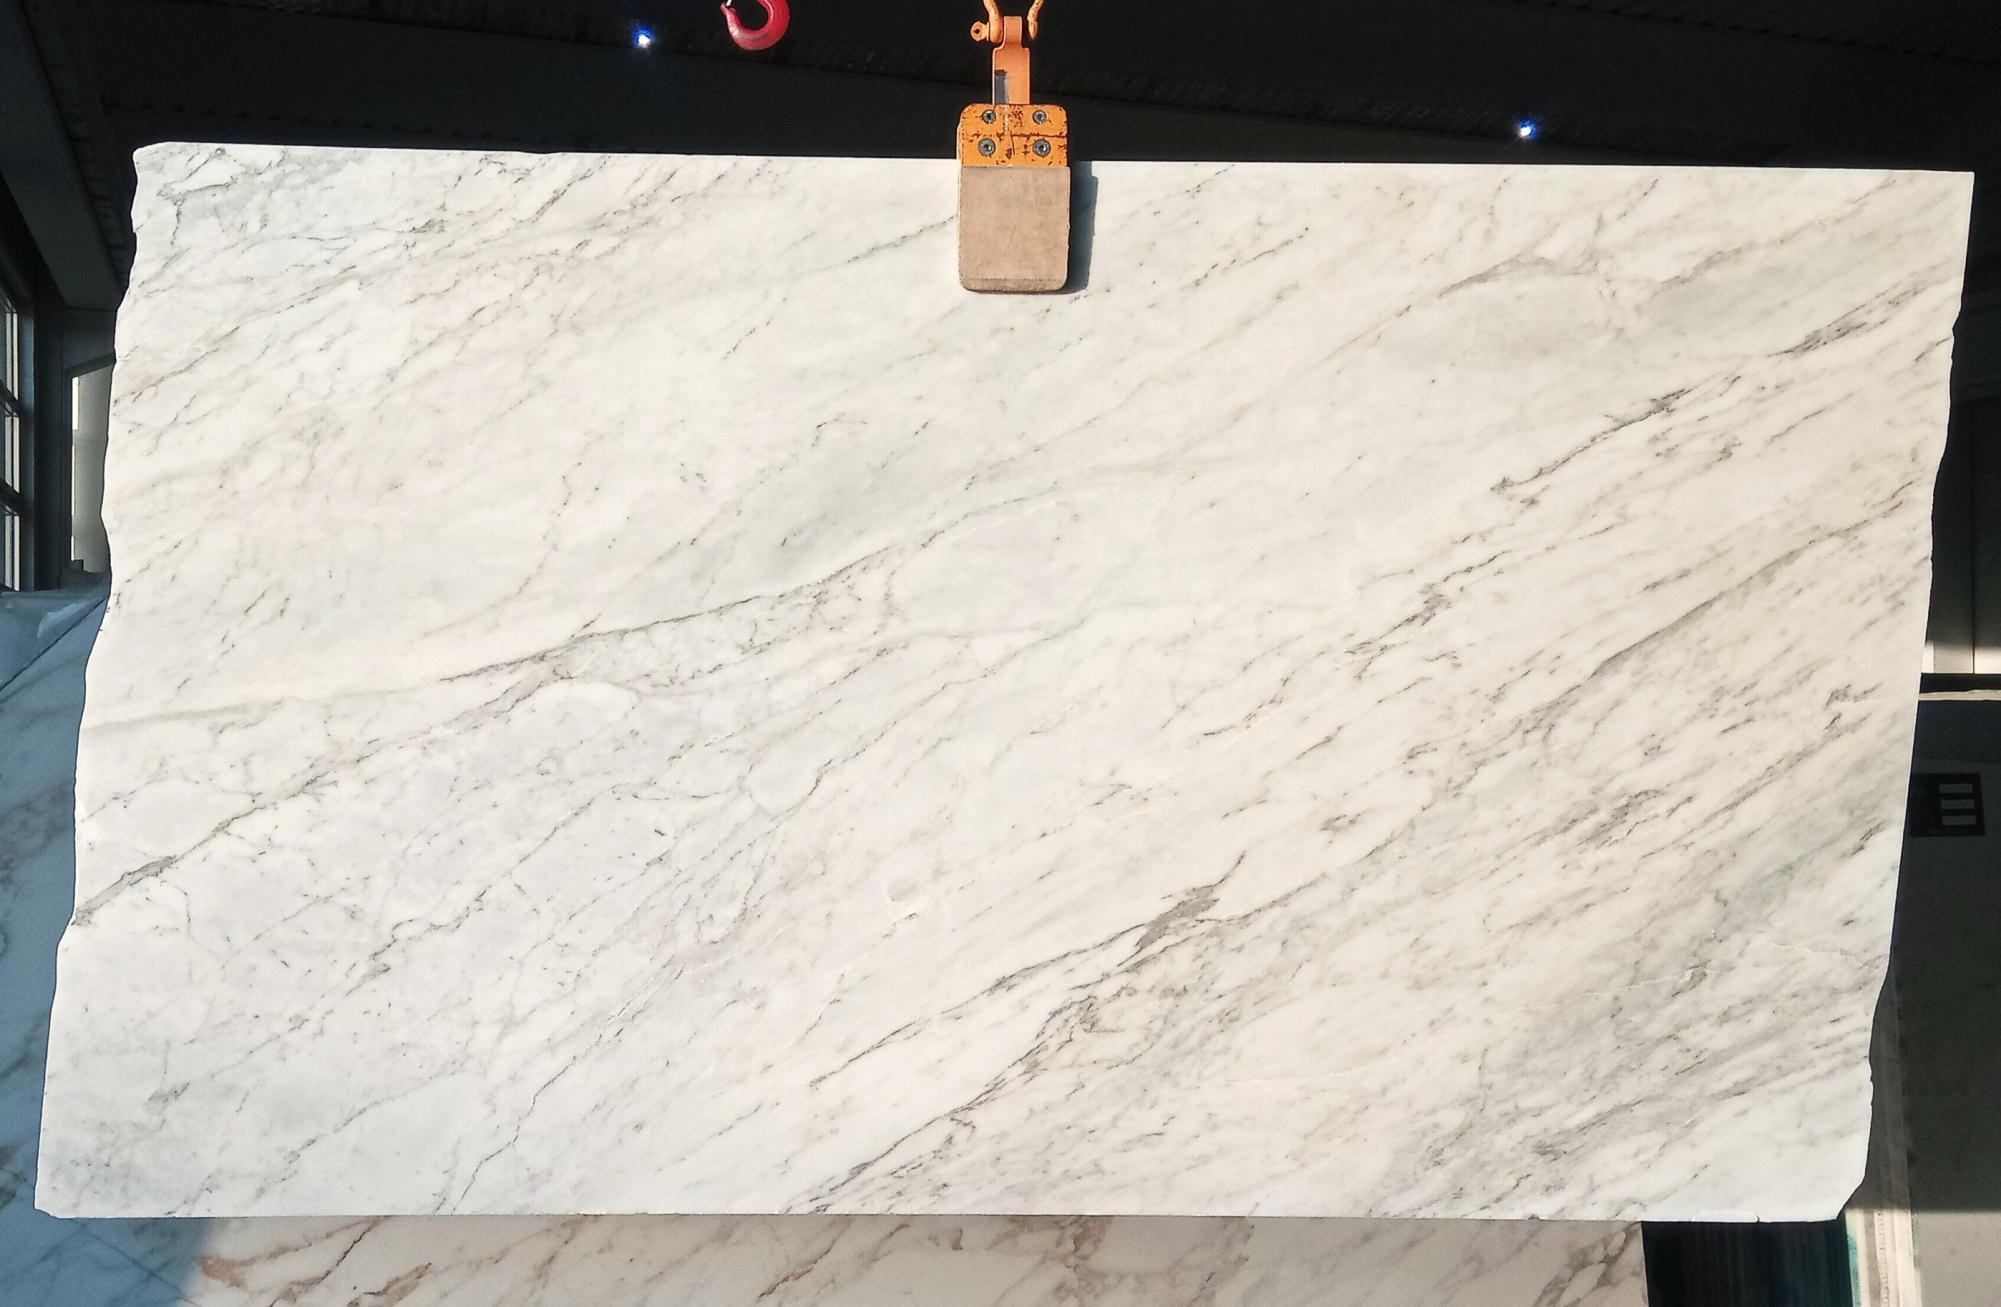 CALACATTA ARNI Fourniture Veneto (Italie) d' dalles brillantes en marbre naturel Z0175 , Slab #50